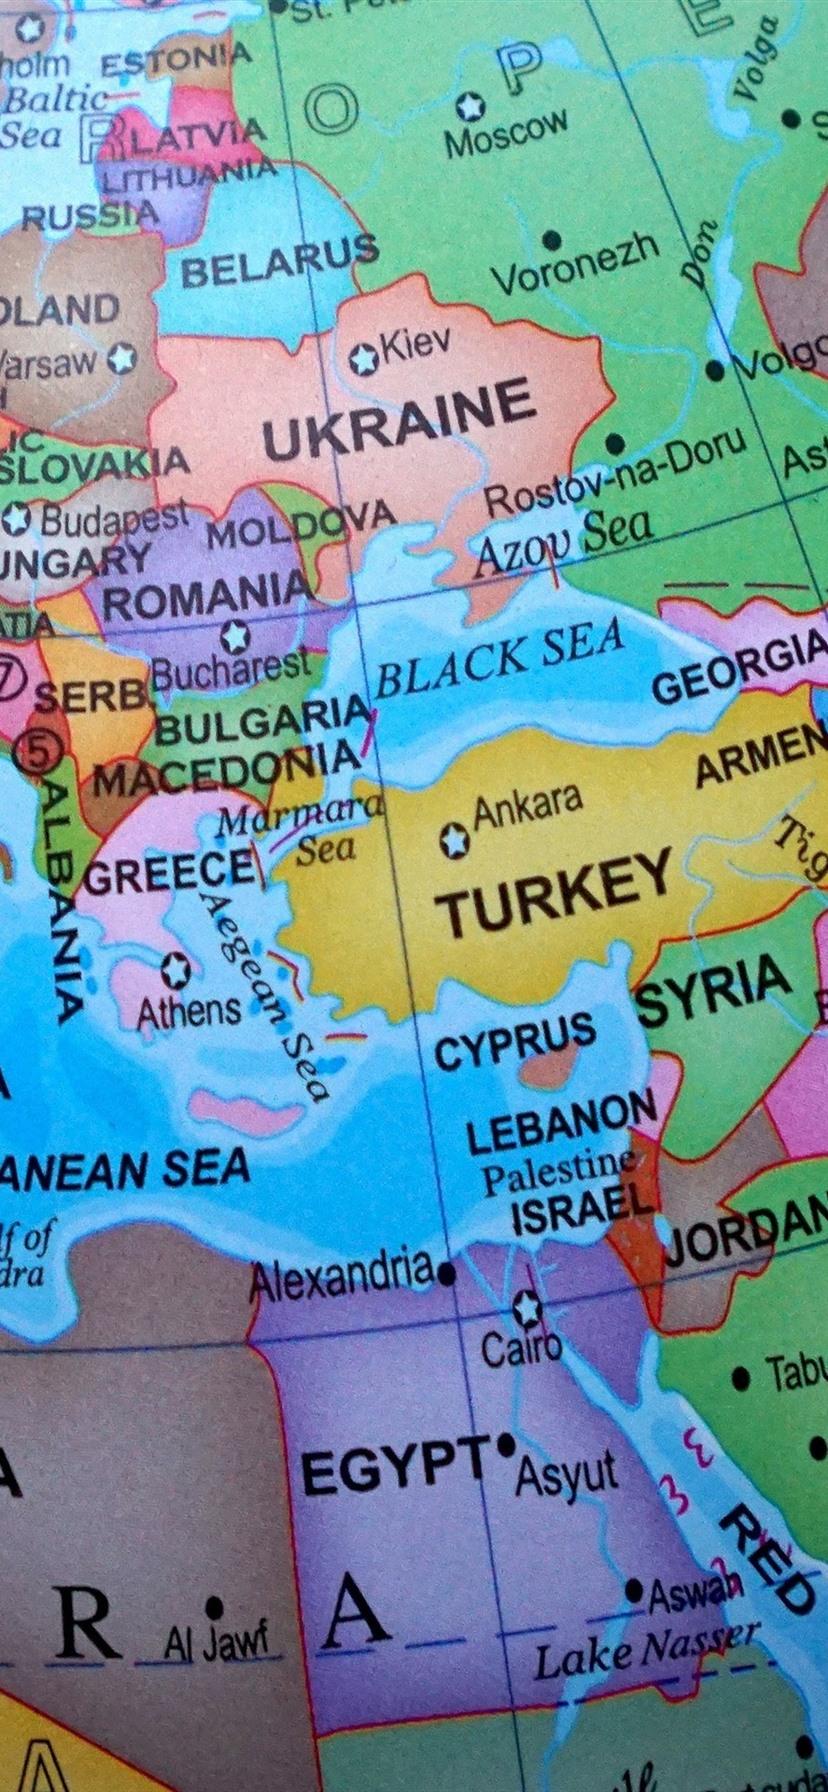 Globus Karte.Globus Karte 3840x2160 Uhd 4k Hintergrundbilder Hd Bild